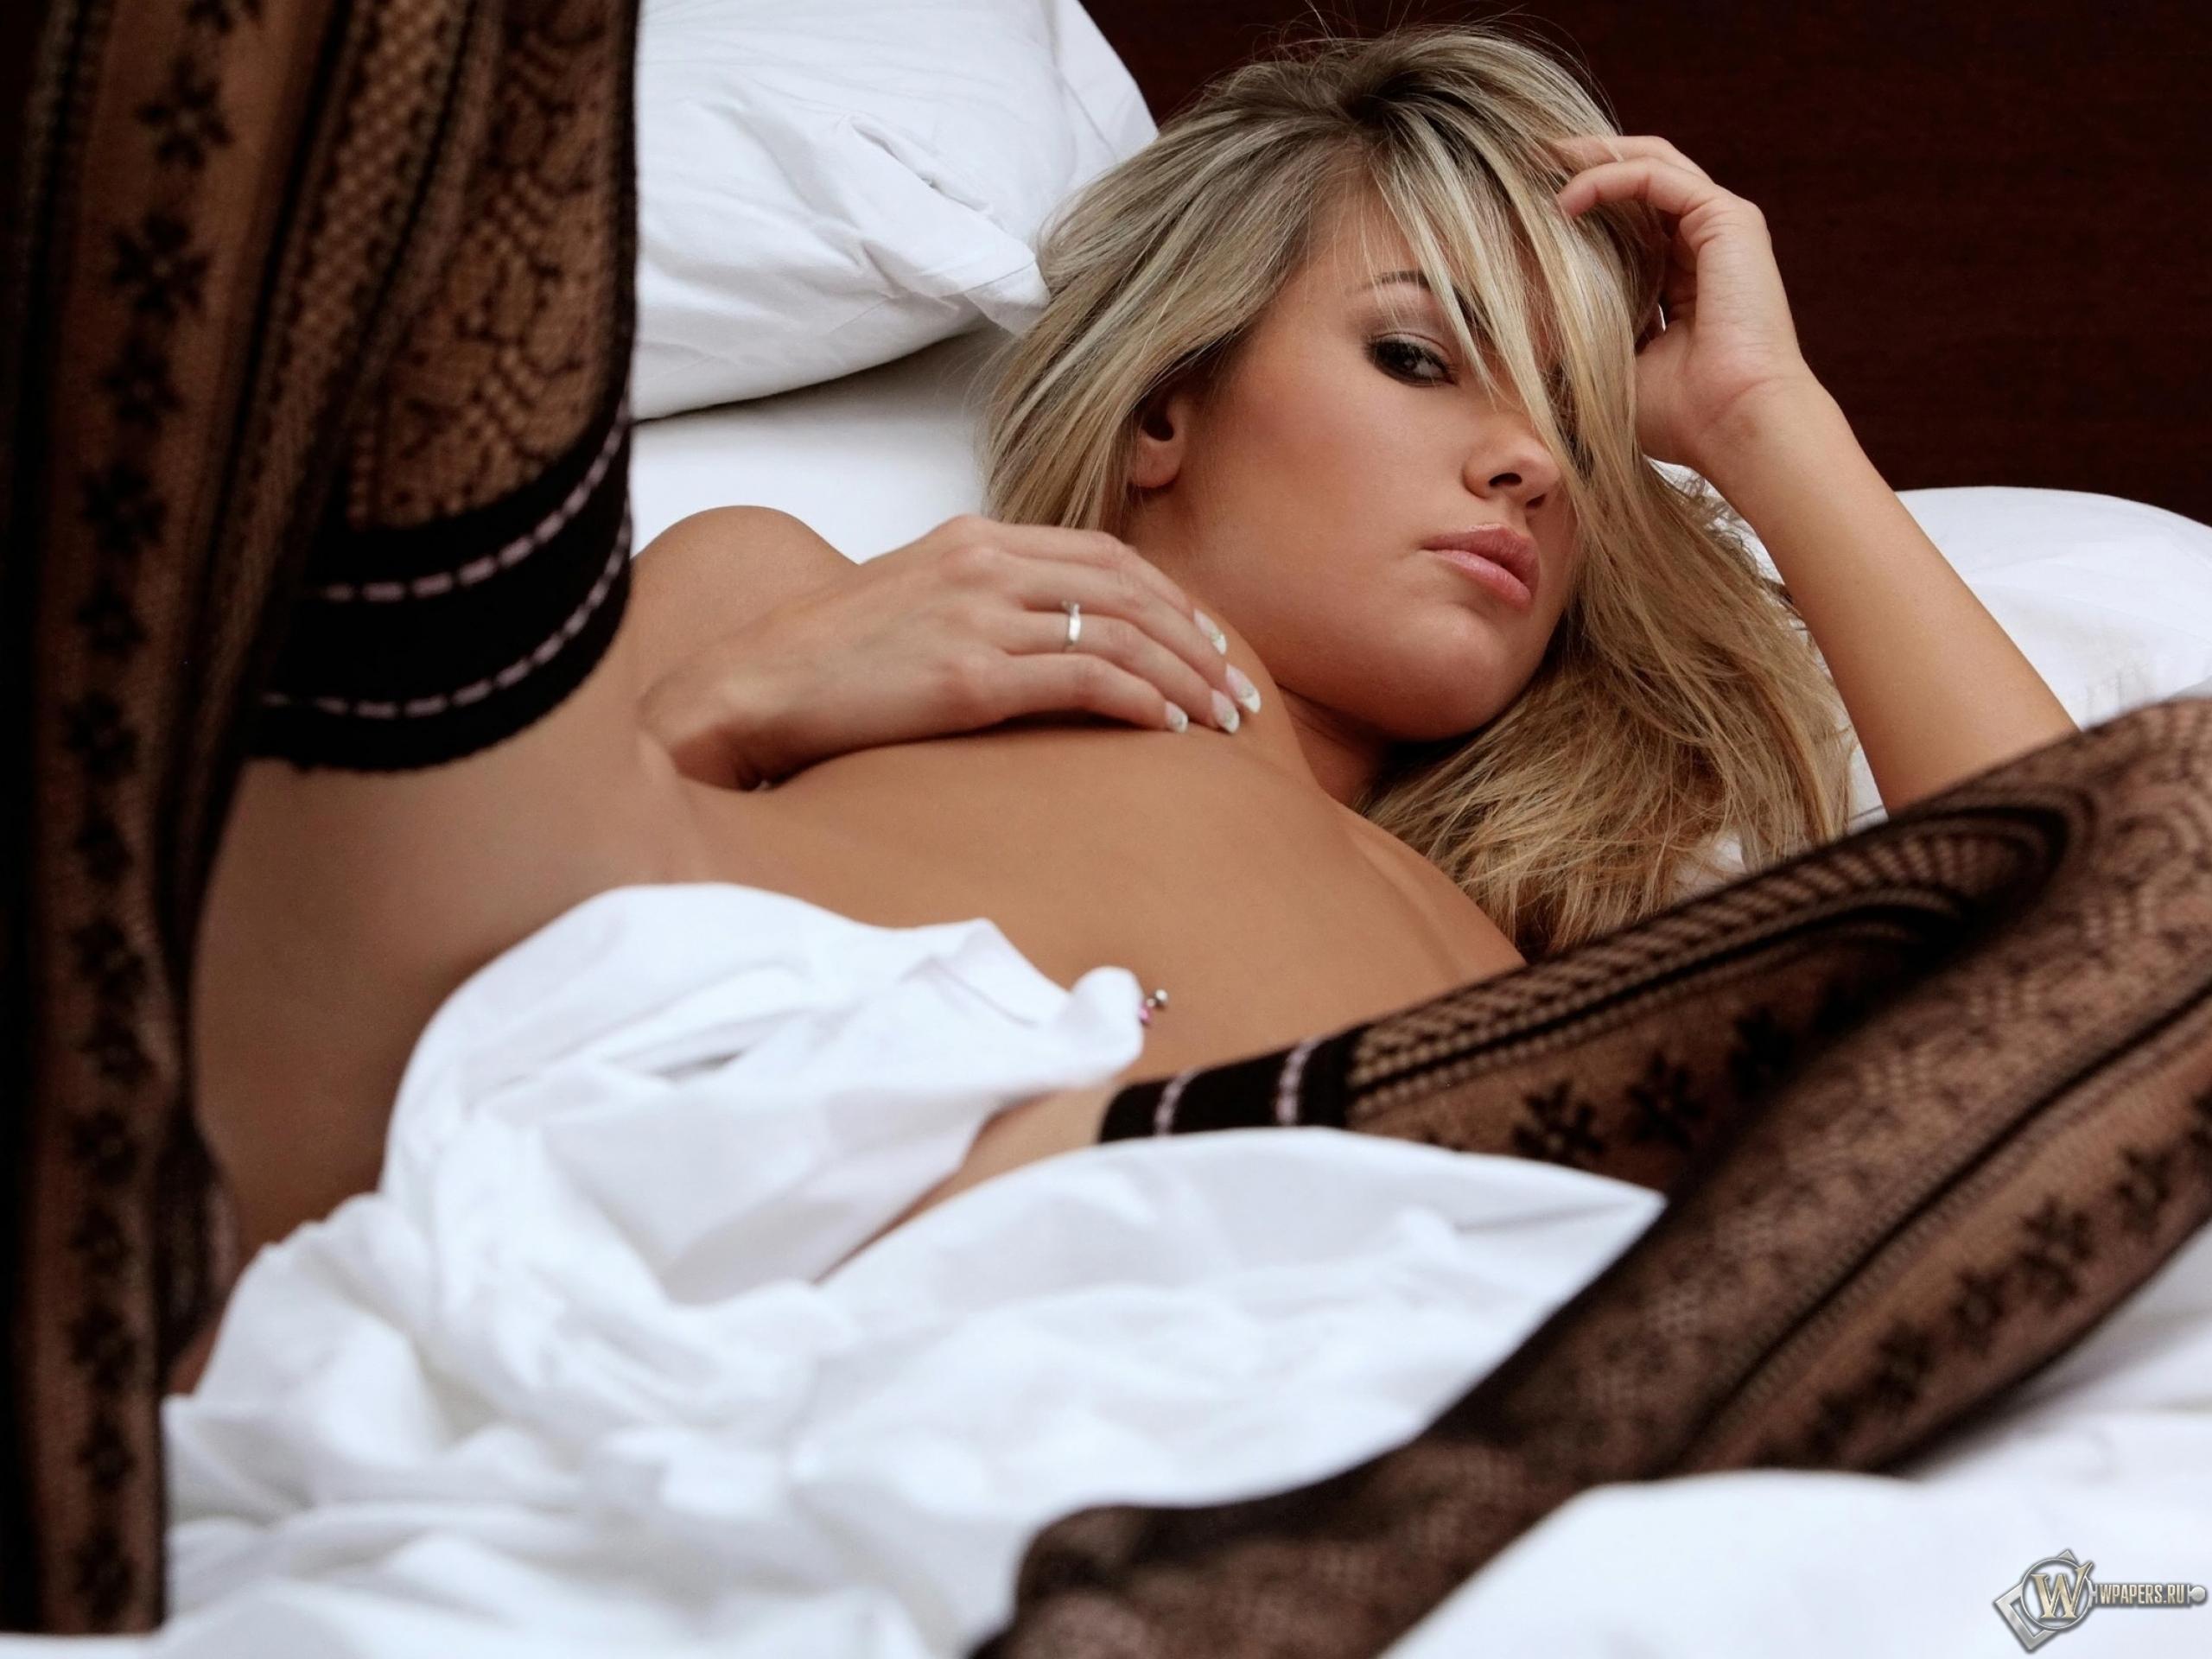 Erotika_Girls_Nude_27952-3000x2000.